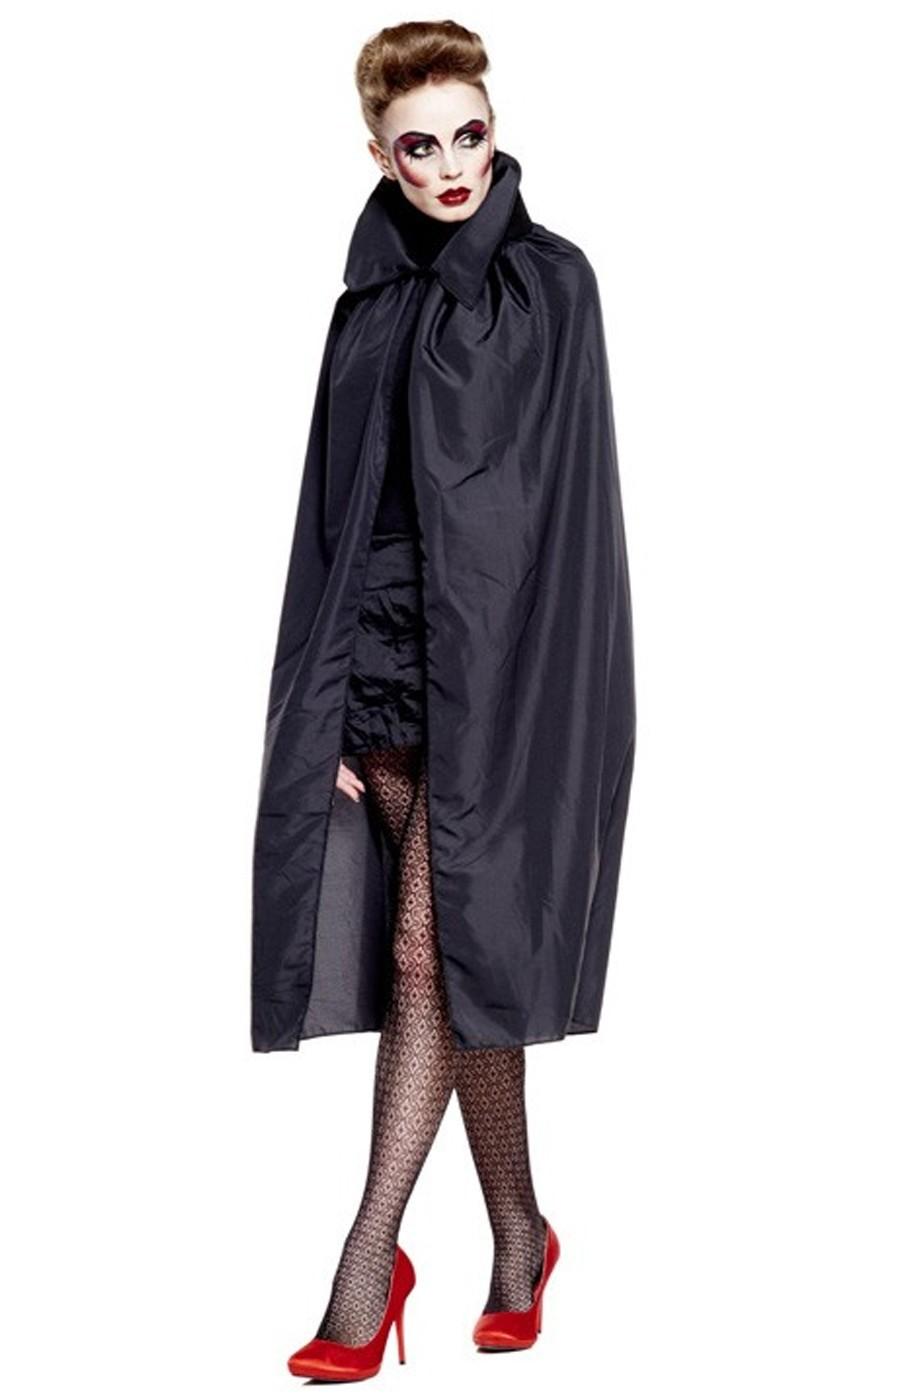 Mantello adulto NERO per vampiri 120 cm